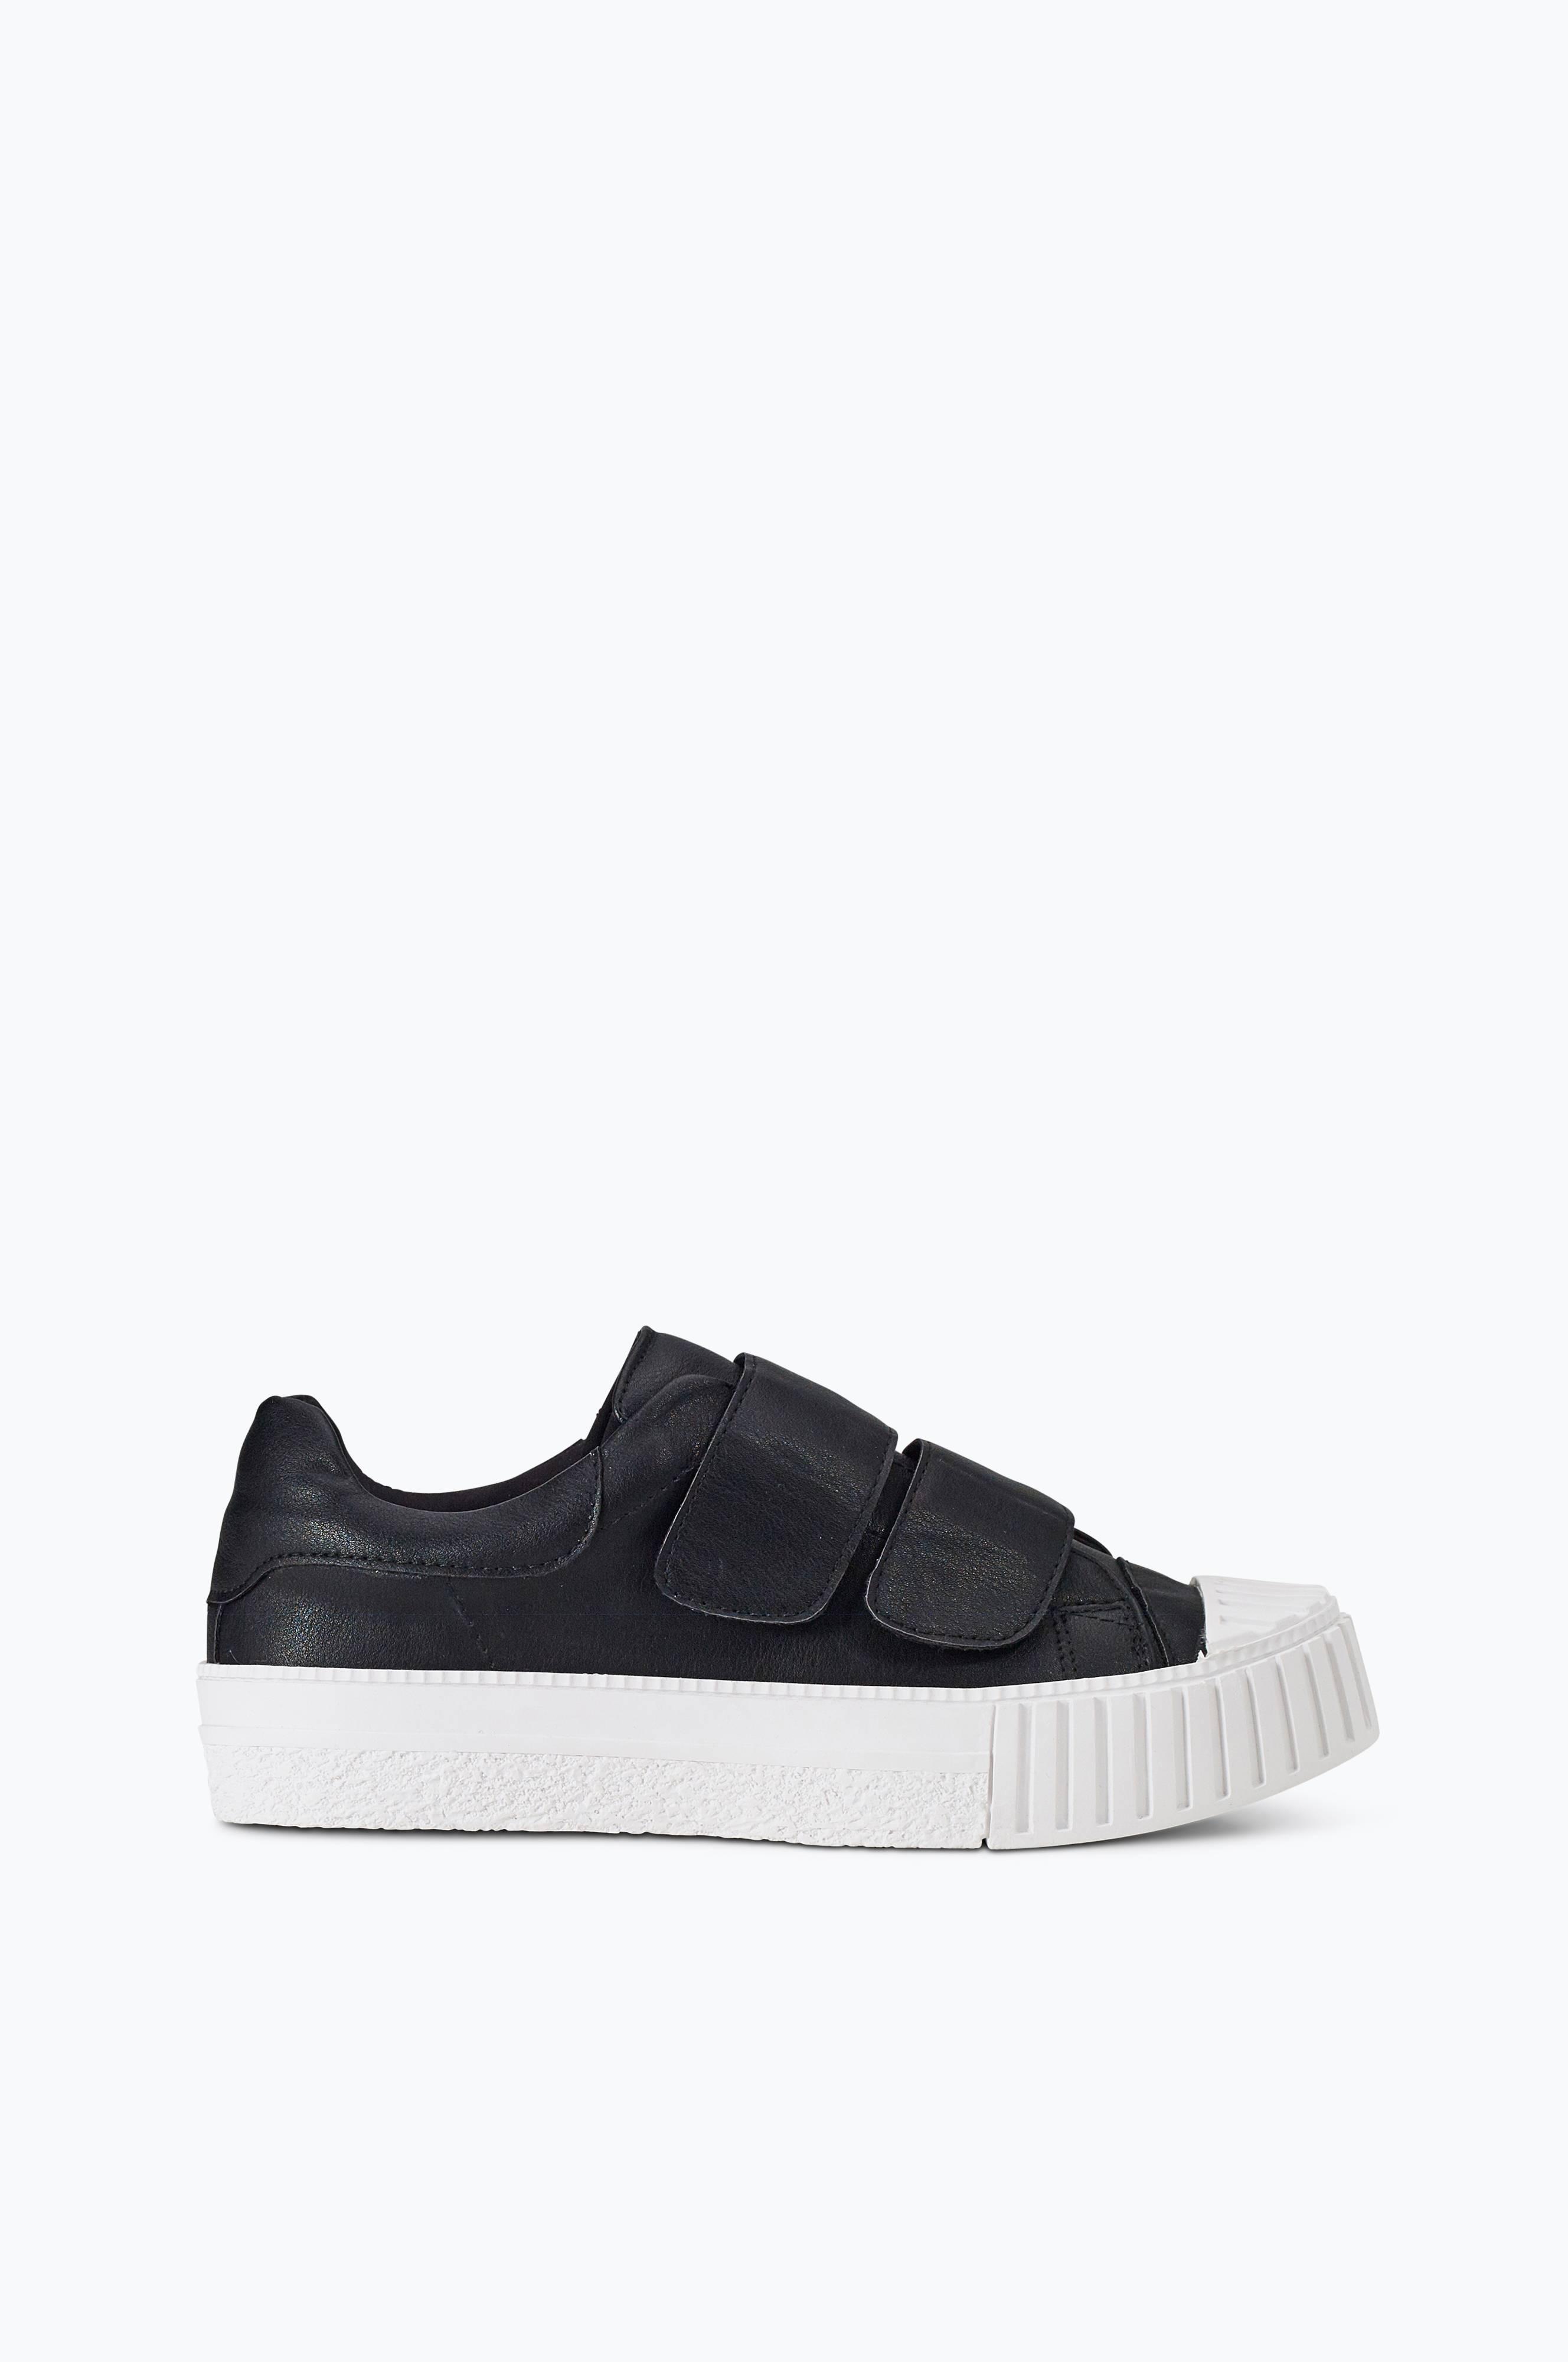 Ellos Shoes Sneakers Trend Velcro med platå Svart Dam